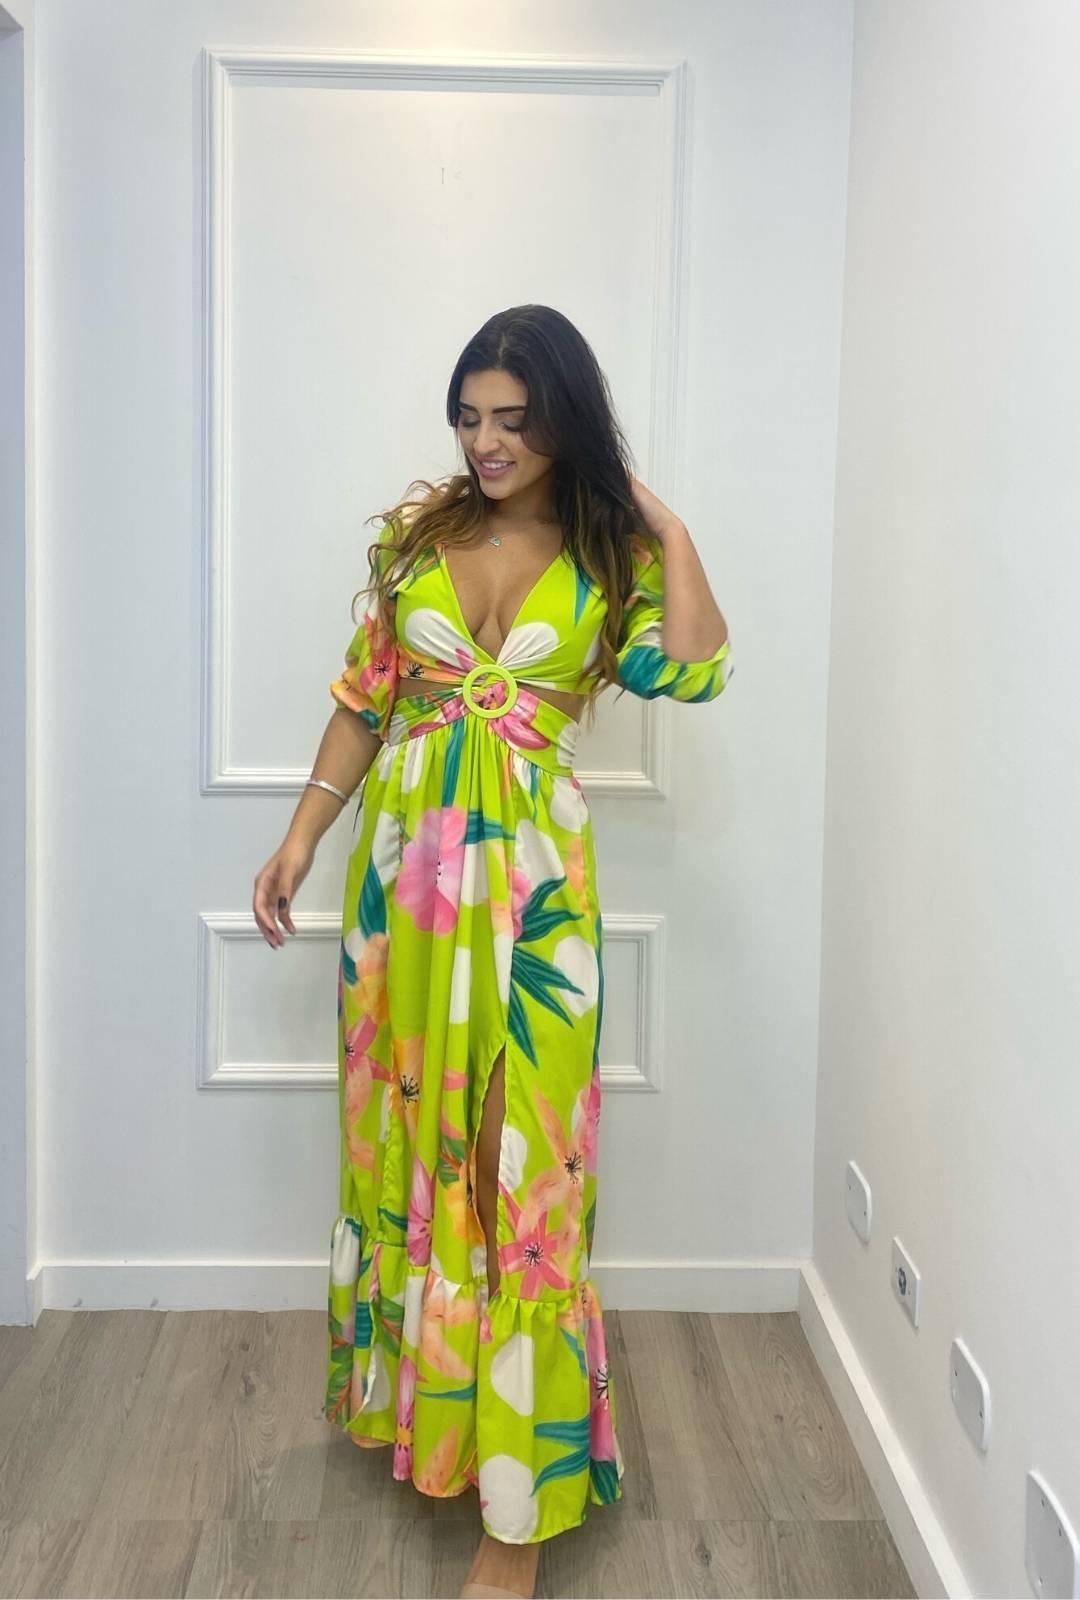 Vestido Thamirys Longo Floral Crepe Abertura Argola Verde Lima